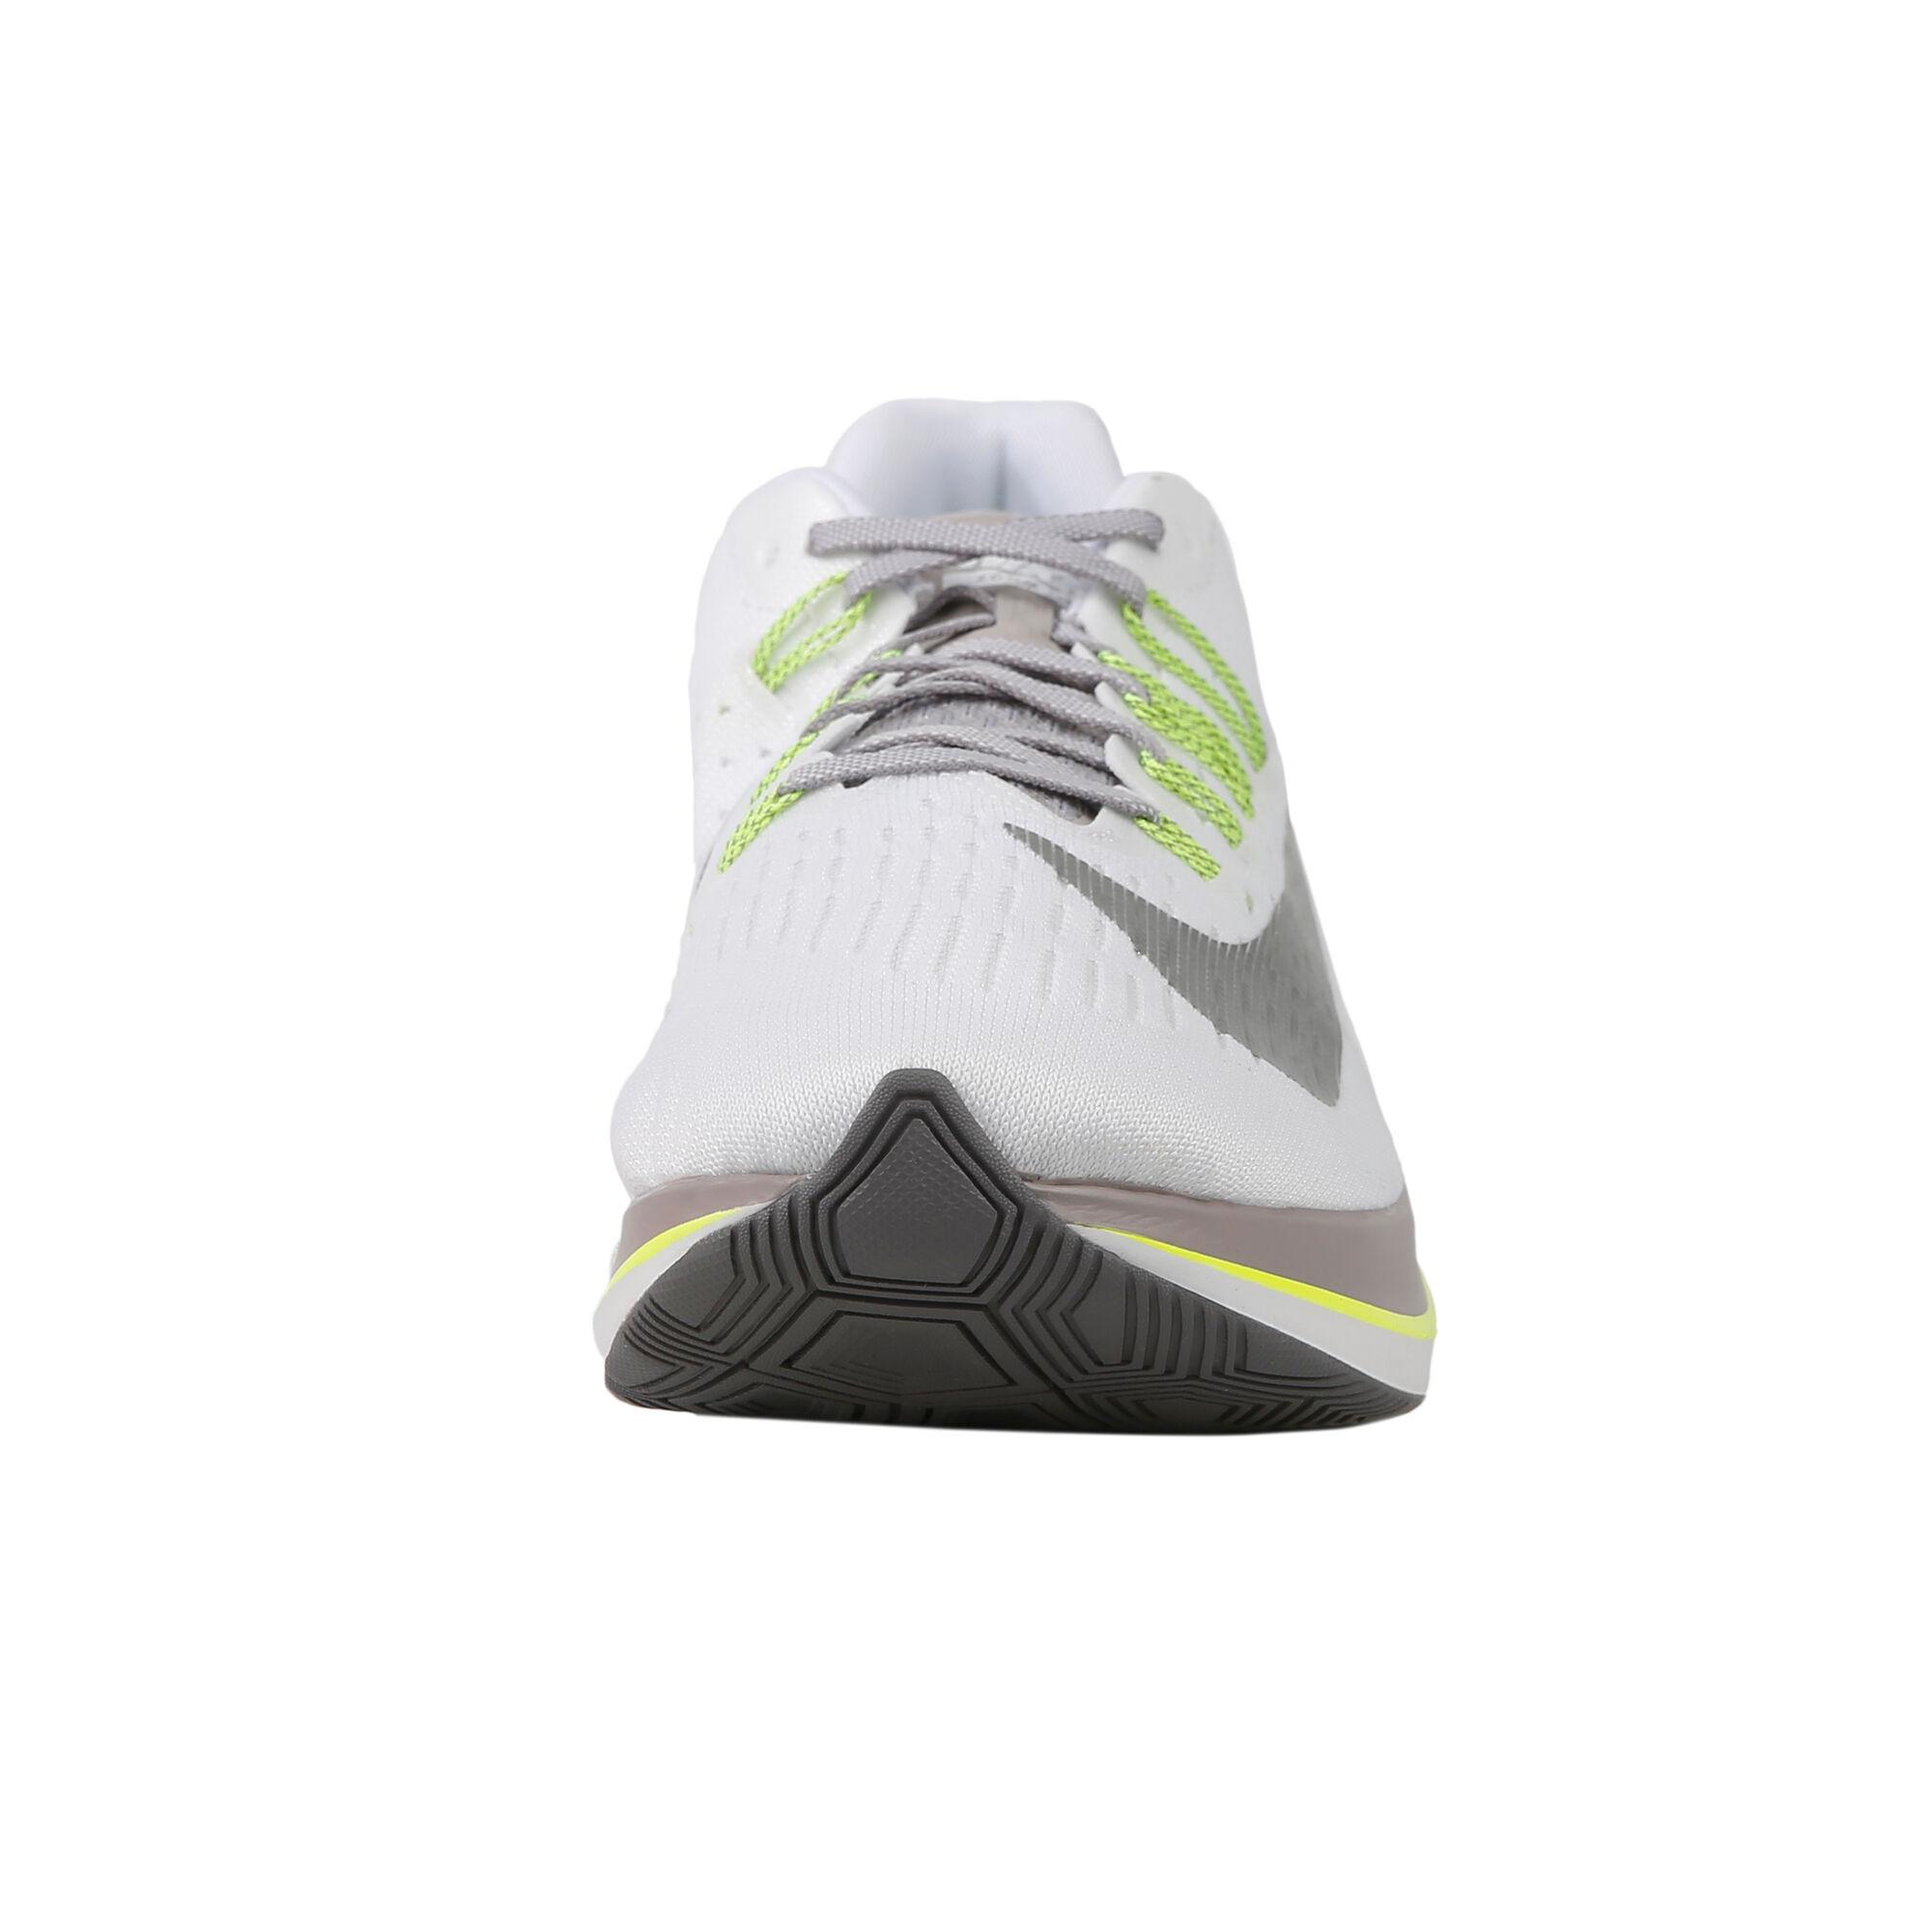 9f758233f9b5 Nike Zoom Fly Neutralschuh Herren - Weiß